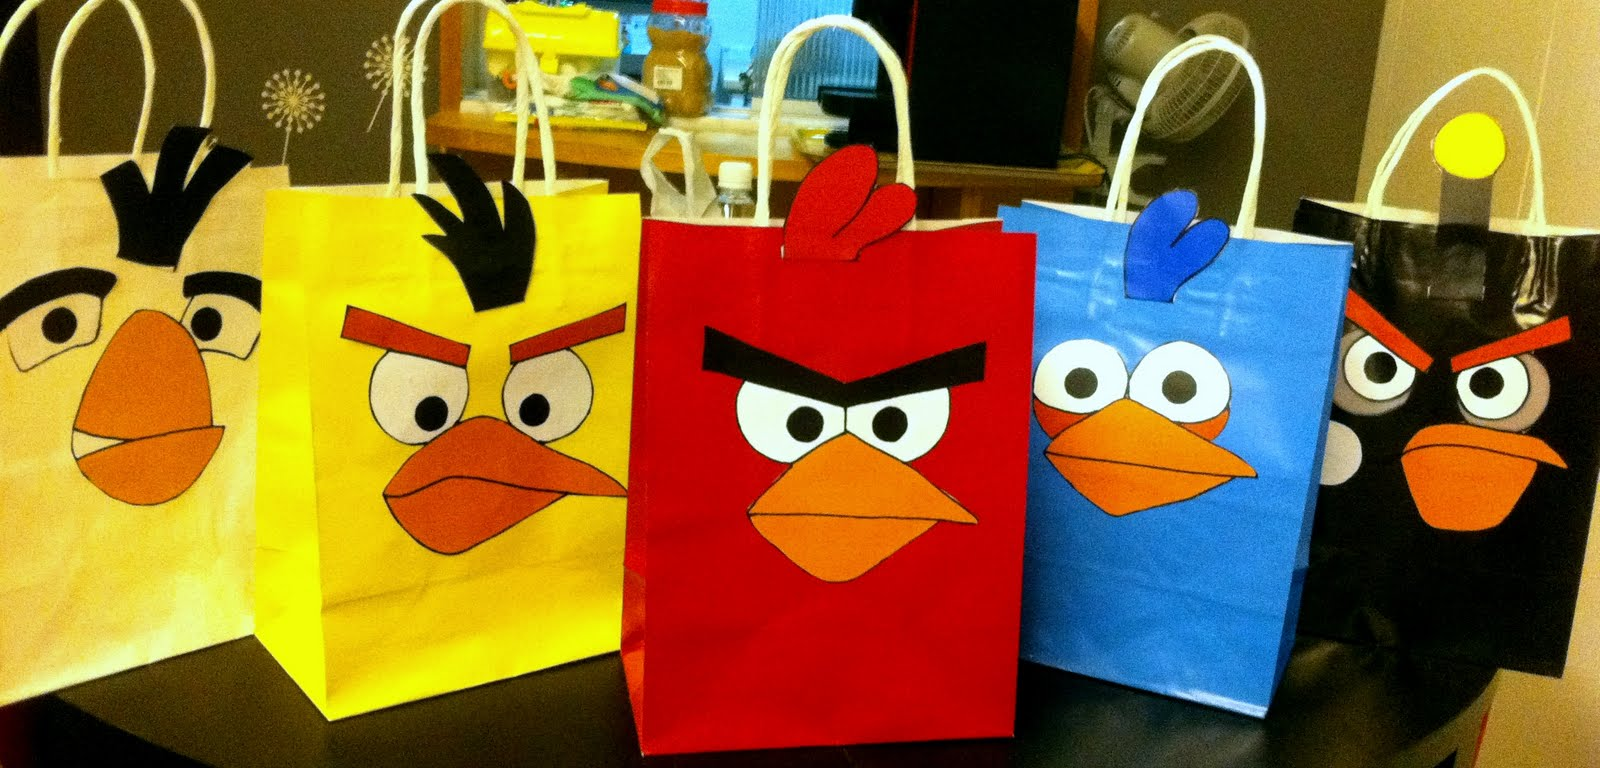 60f1bb320 como decorar una fiesta infantil de angry birds